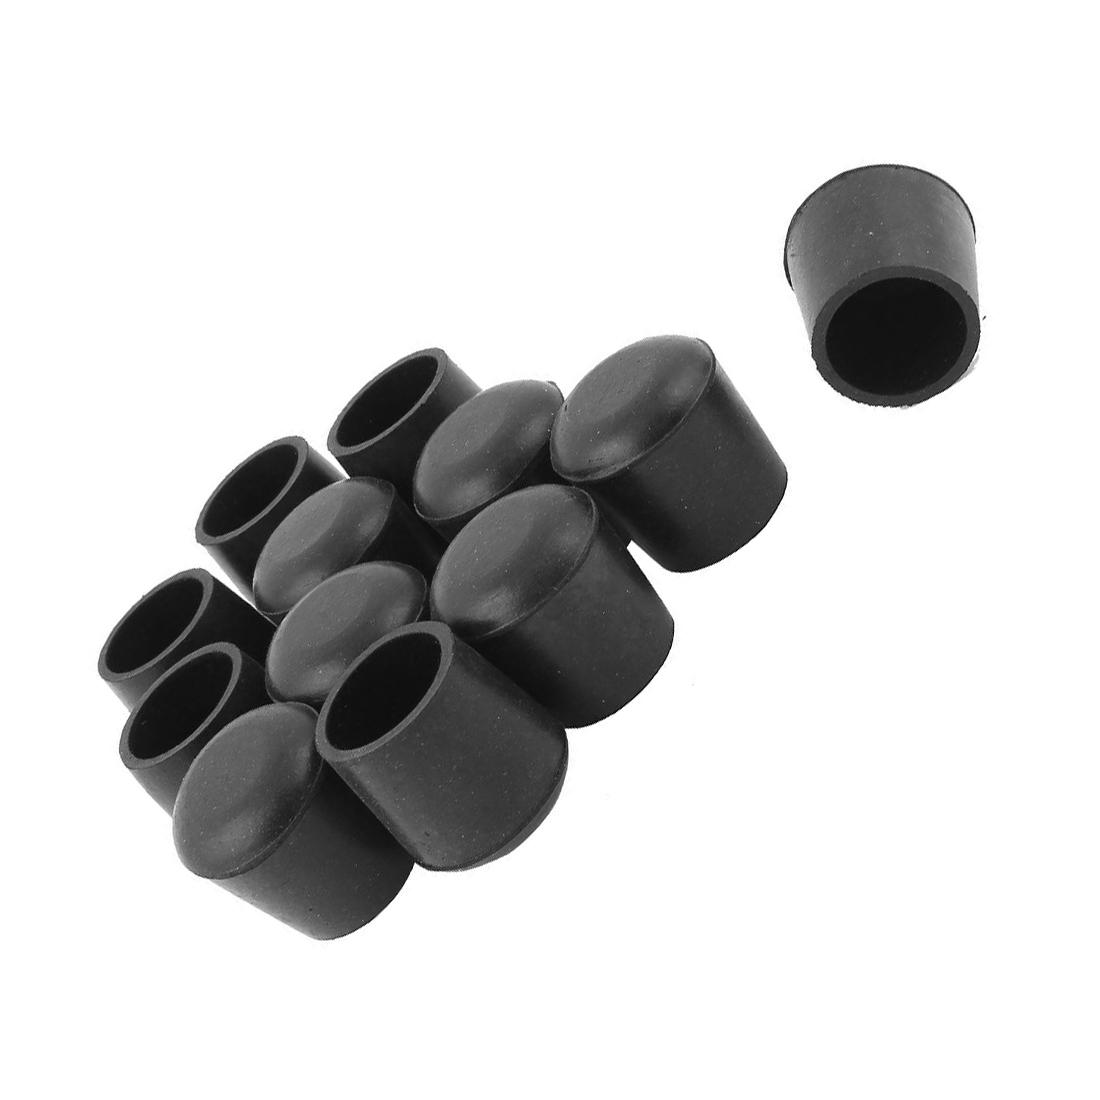 gummi fuesse fuer gehhilfen hocker stuhl spitze 12 stueck schwarz j4 ebay. Black Bedroom Furniture Sets. Home Design Ideas